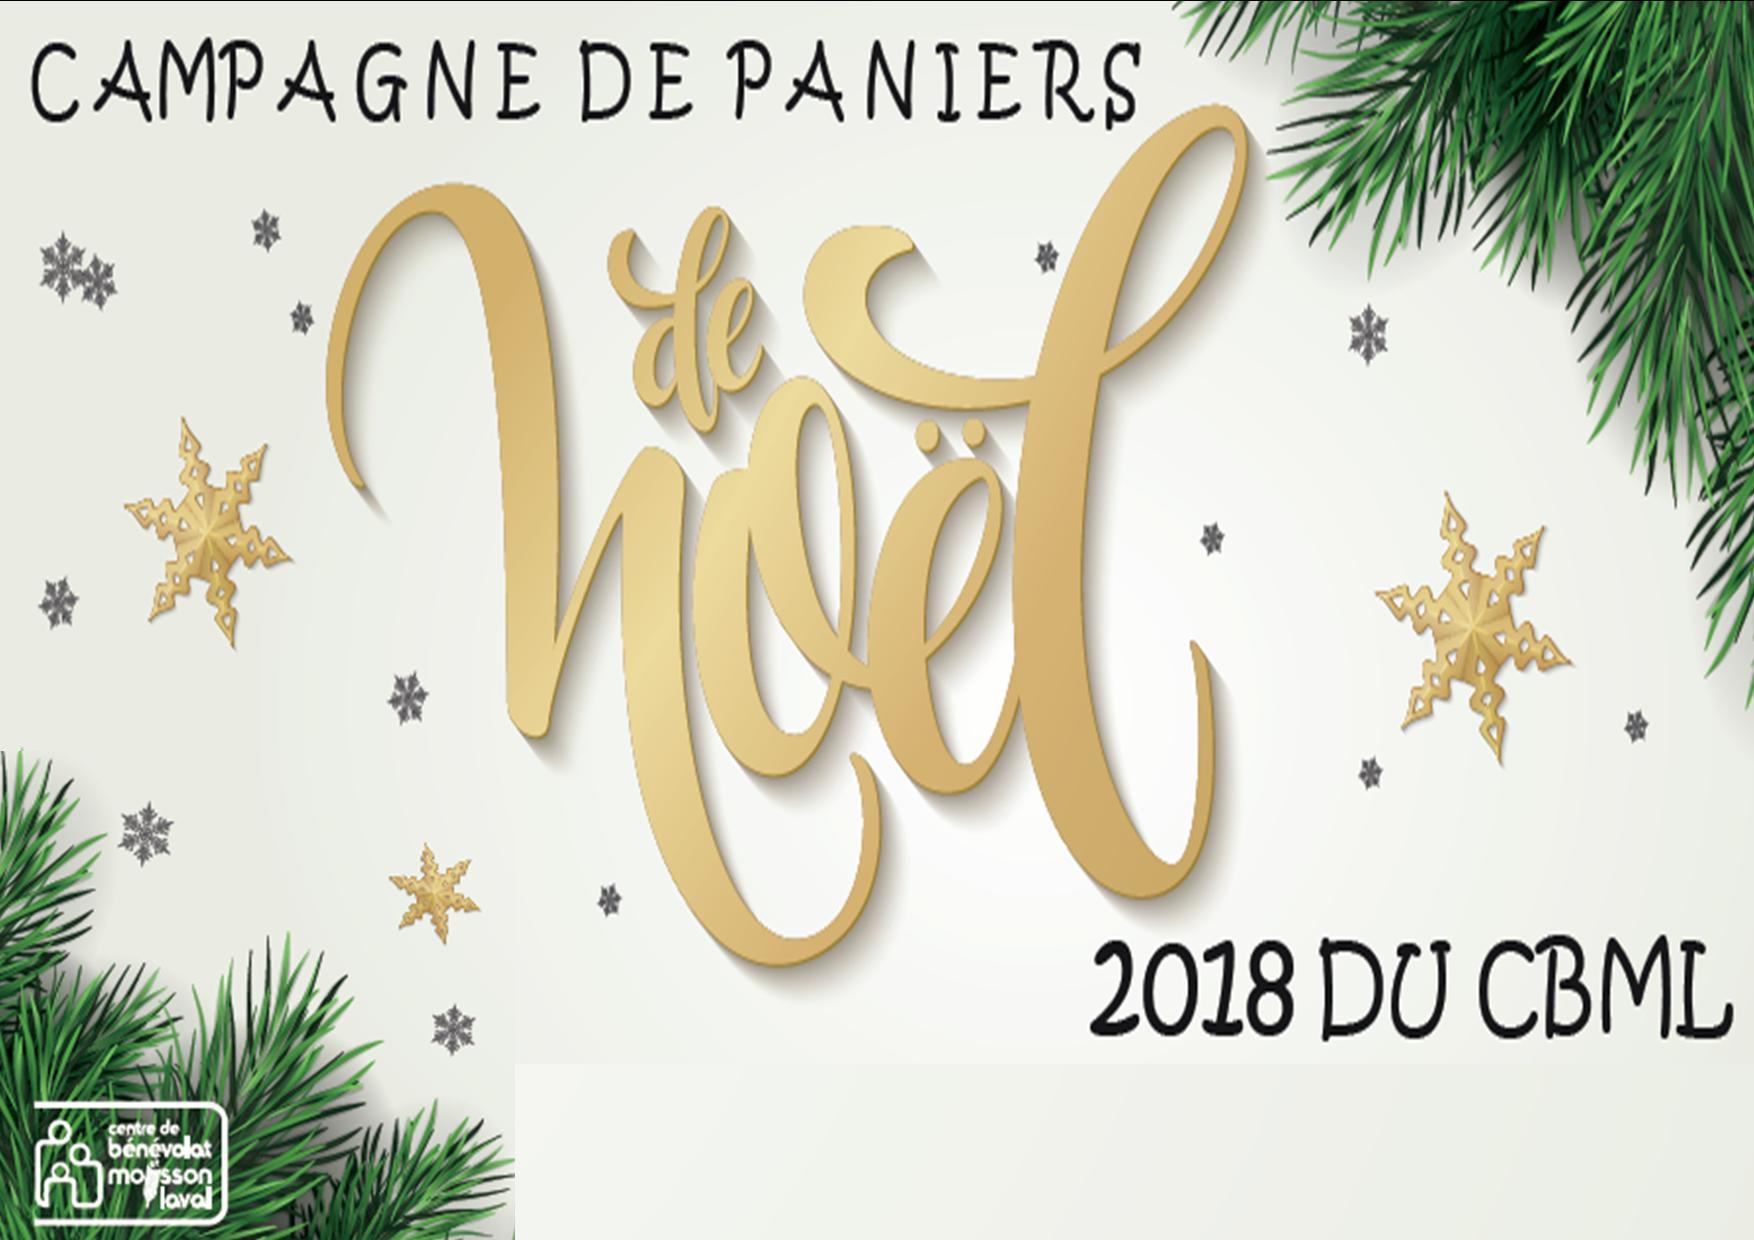 benevolat noel 2018 montreal Campagne de paniers de Noël – Centre de bénévolat & moisson Laval benevolat noel 2018 montreal